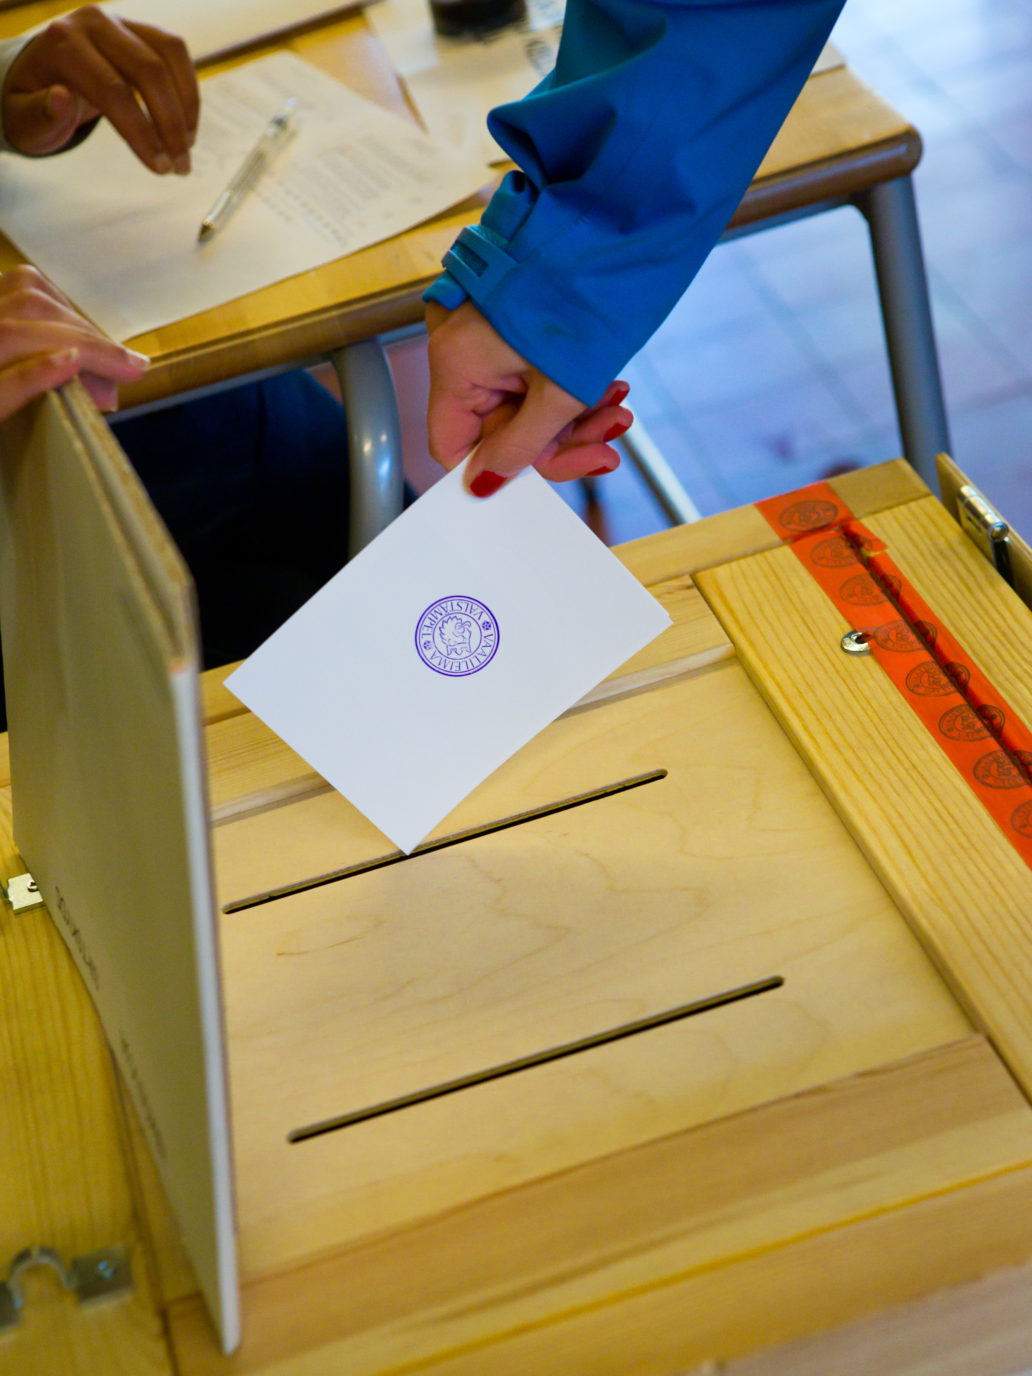 A hand putting a ballot in a box.